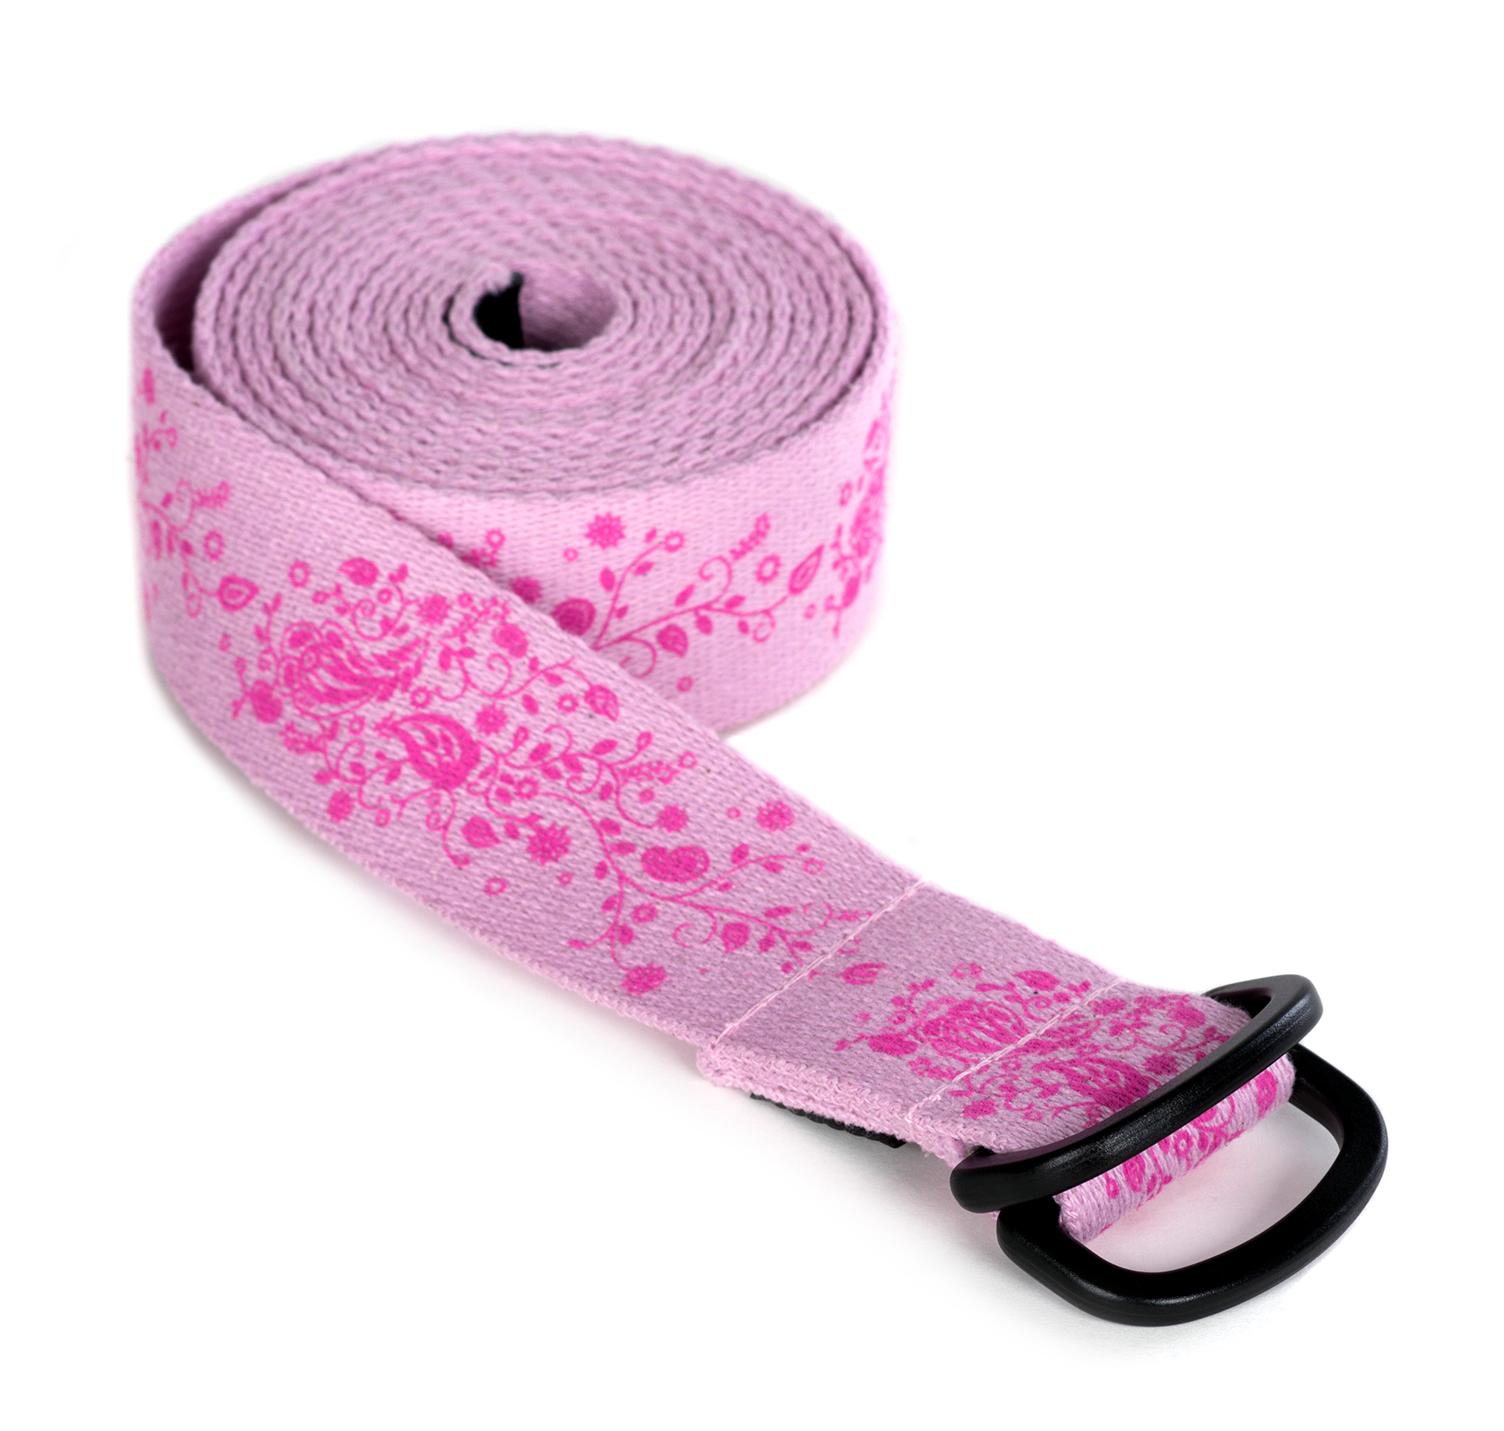 Yoga belt yogibelt 'Indian flower', MB - rose